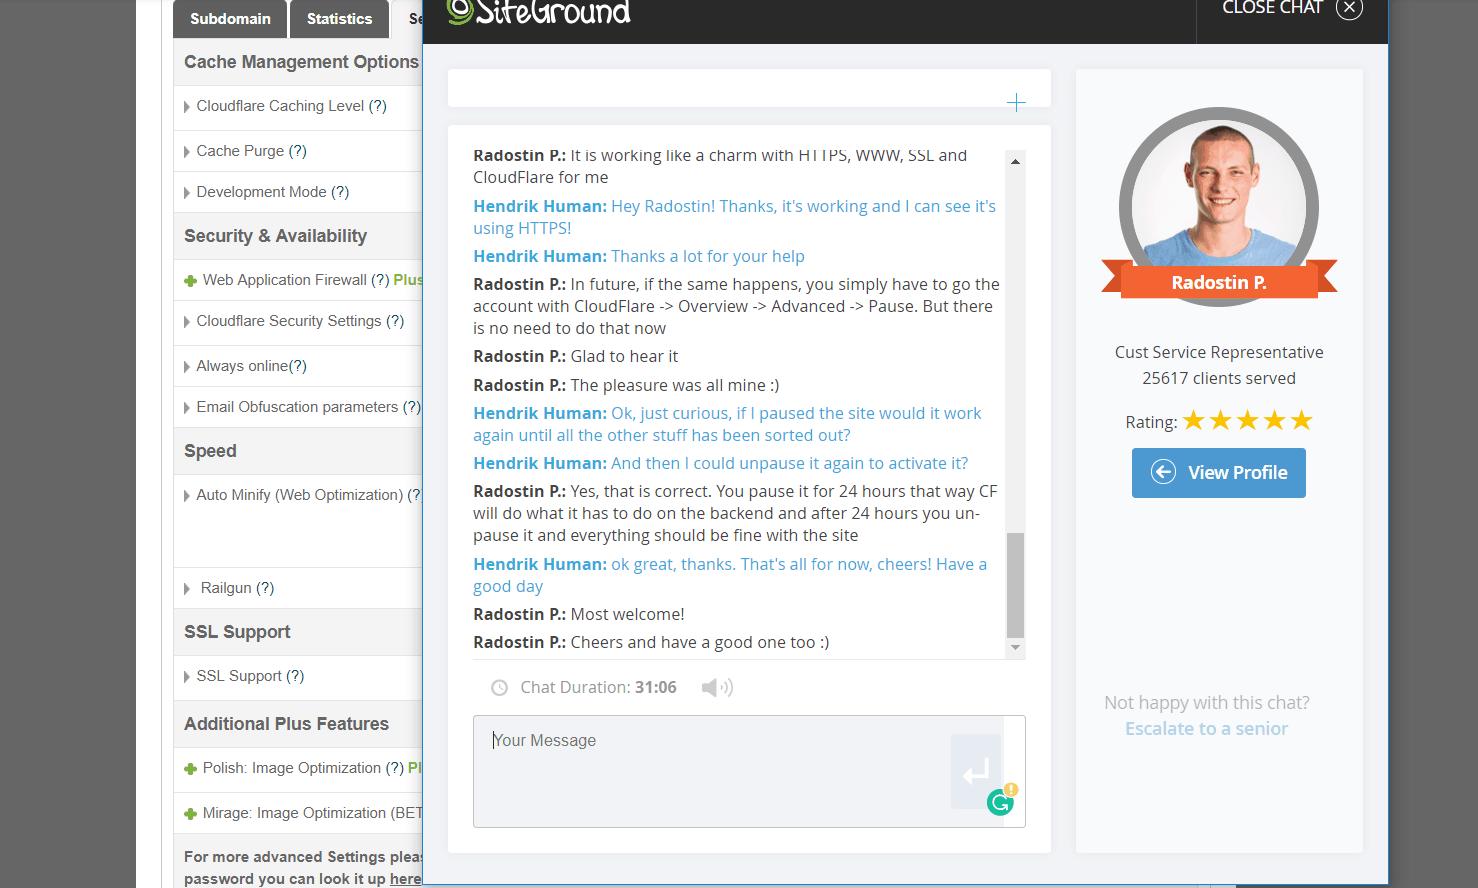 screenshot assistenza via chat con siteground